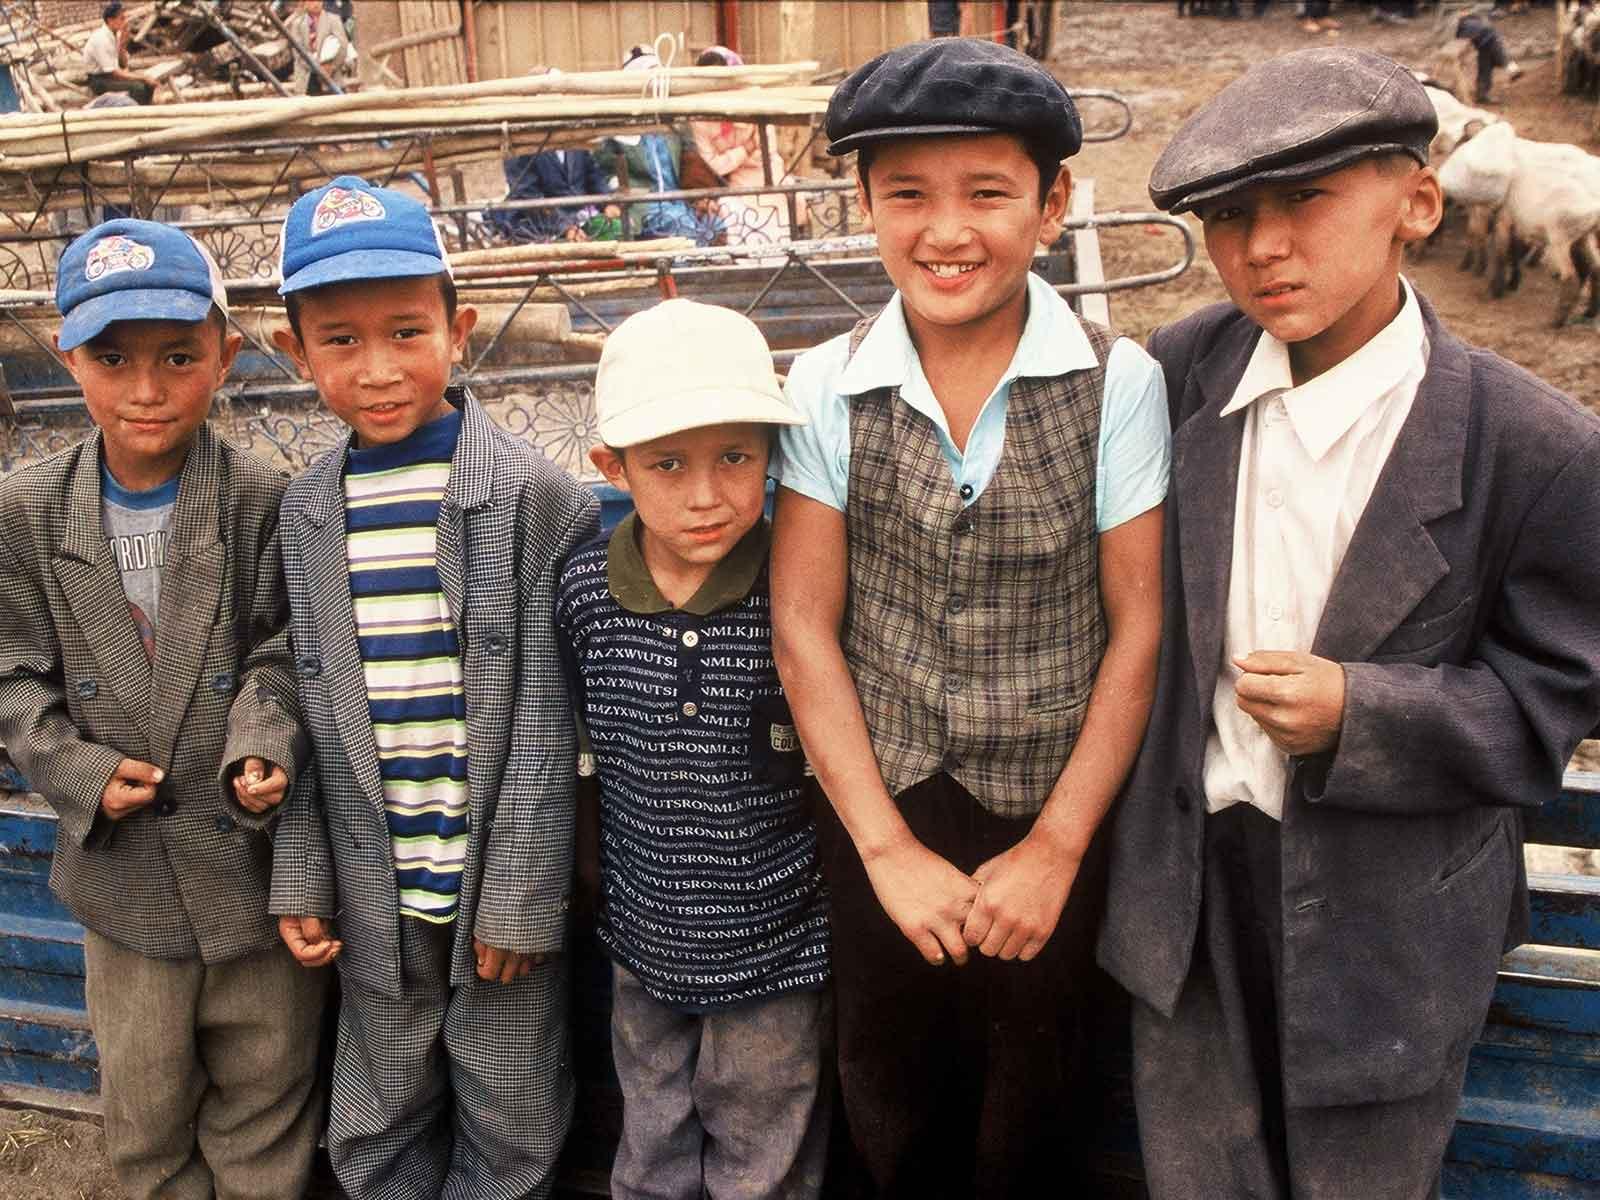 Uyghur youth - Kashgar Sunday Bazaar - China Silk Road Photo Journal - Steven Andrew Martin PhD